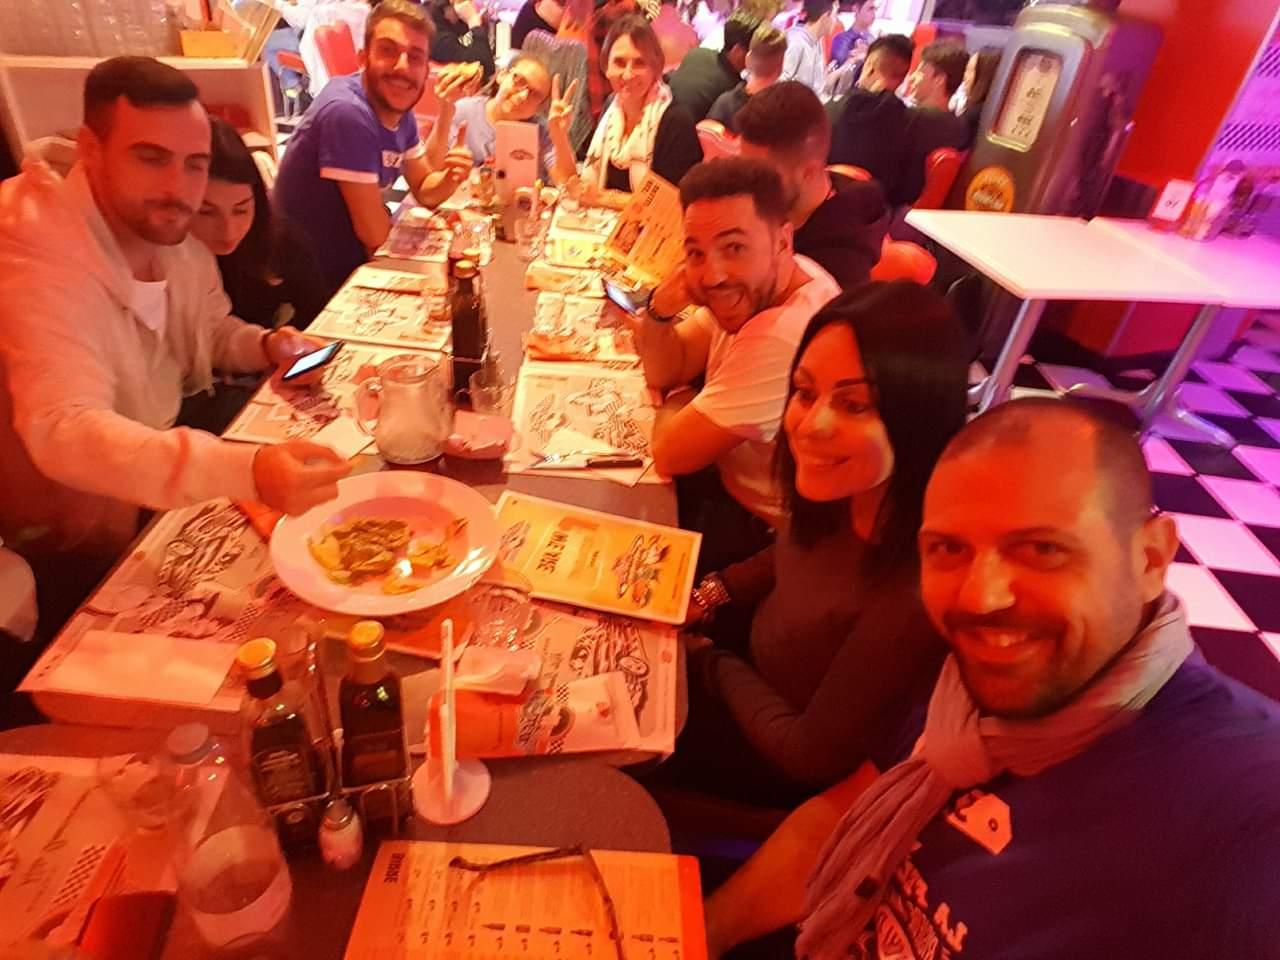 Duolife_2019_corrado_cavarra_networker_sicilia_italia7